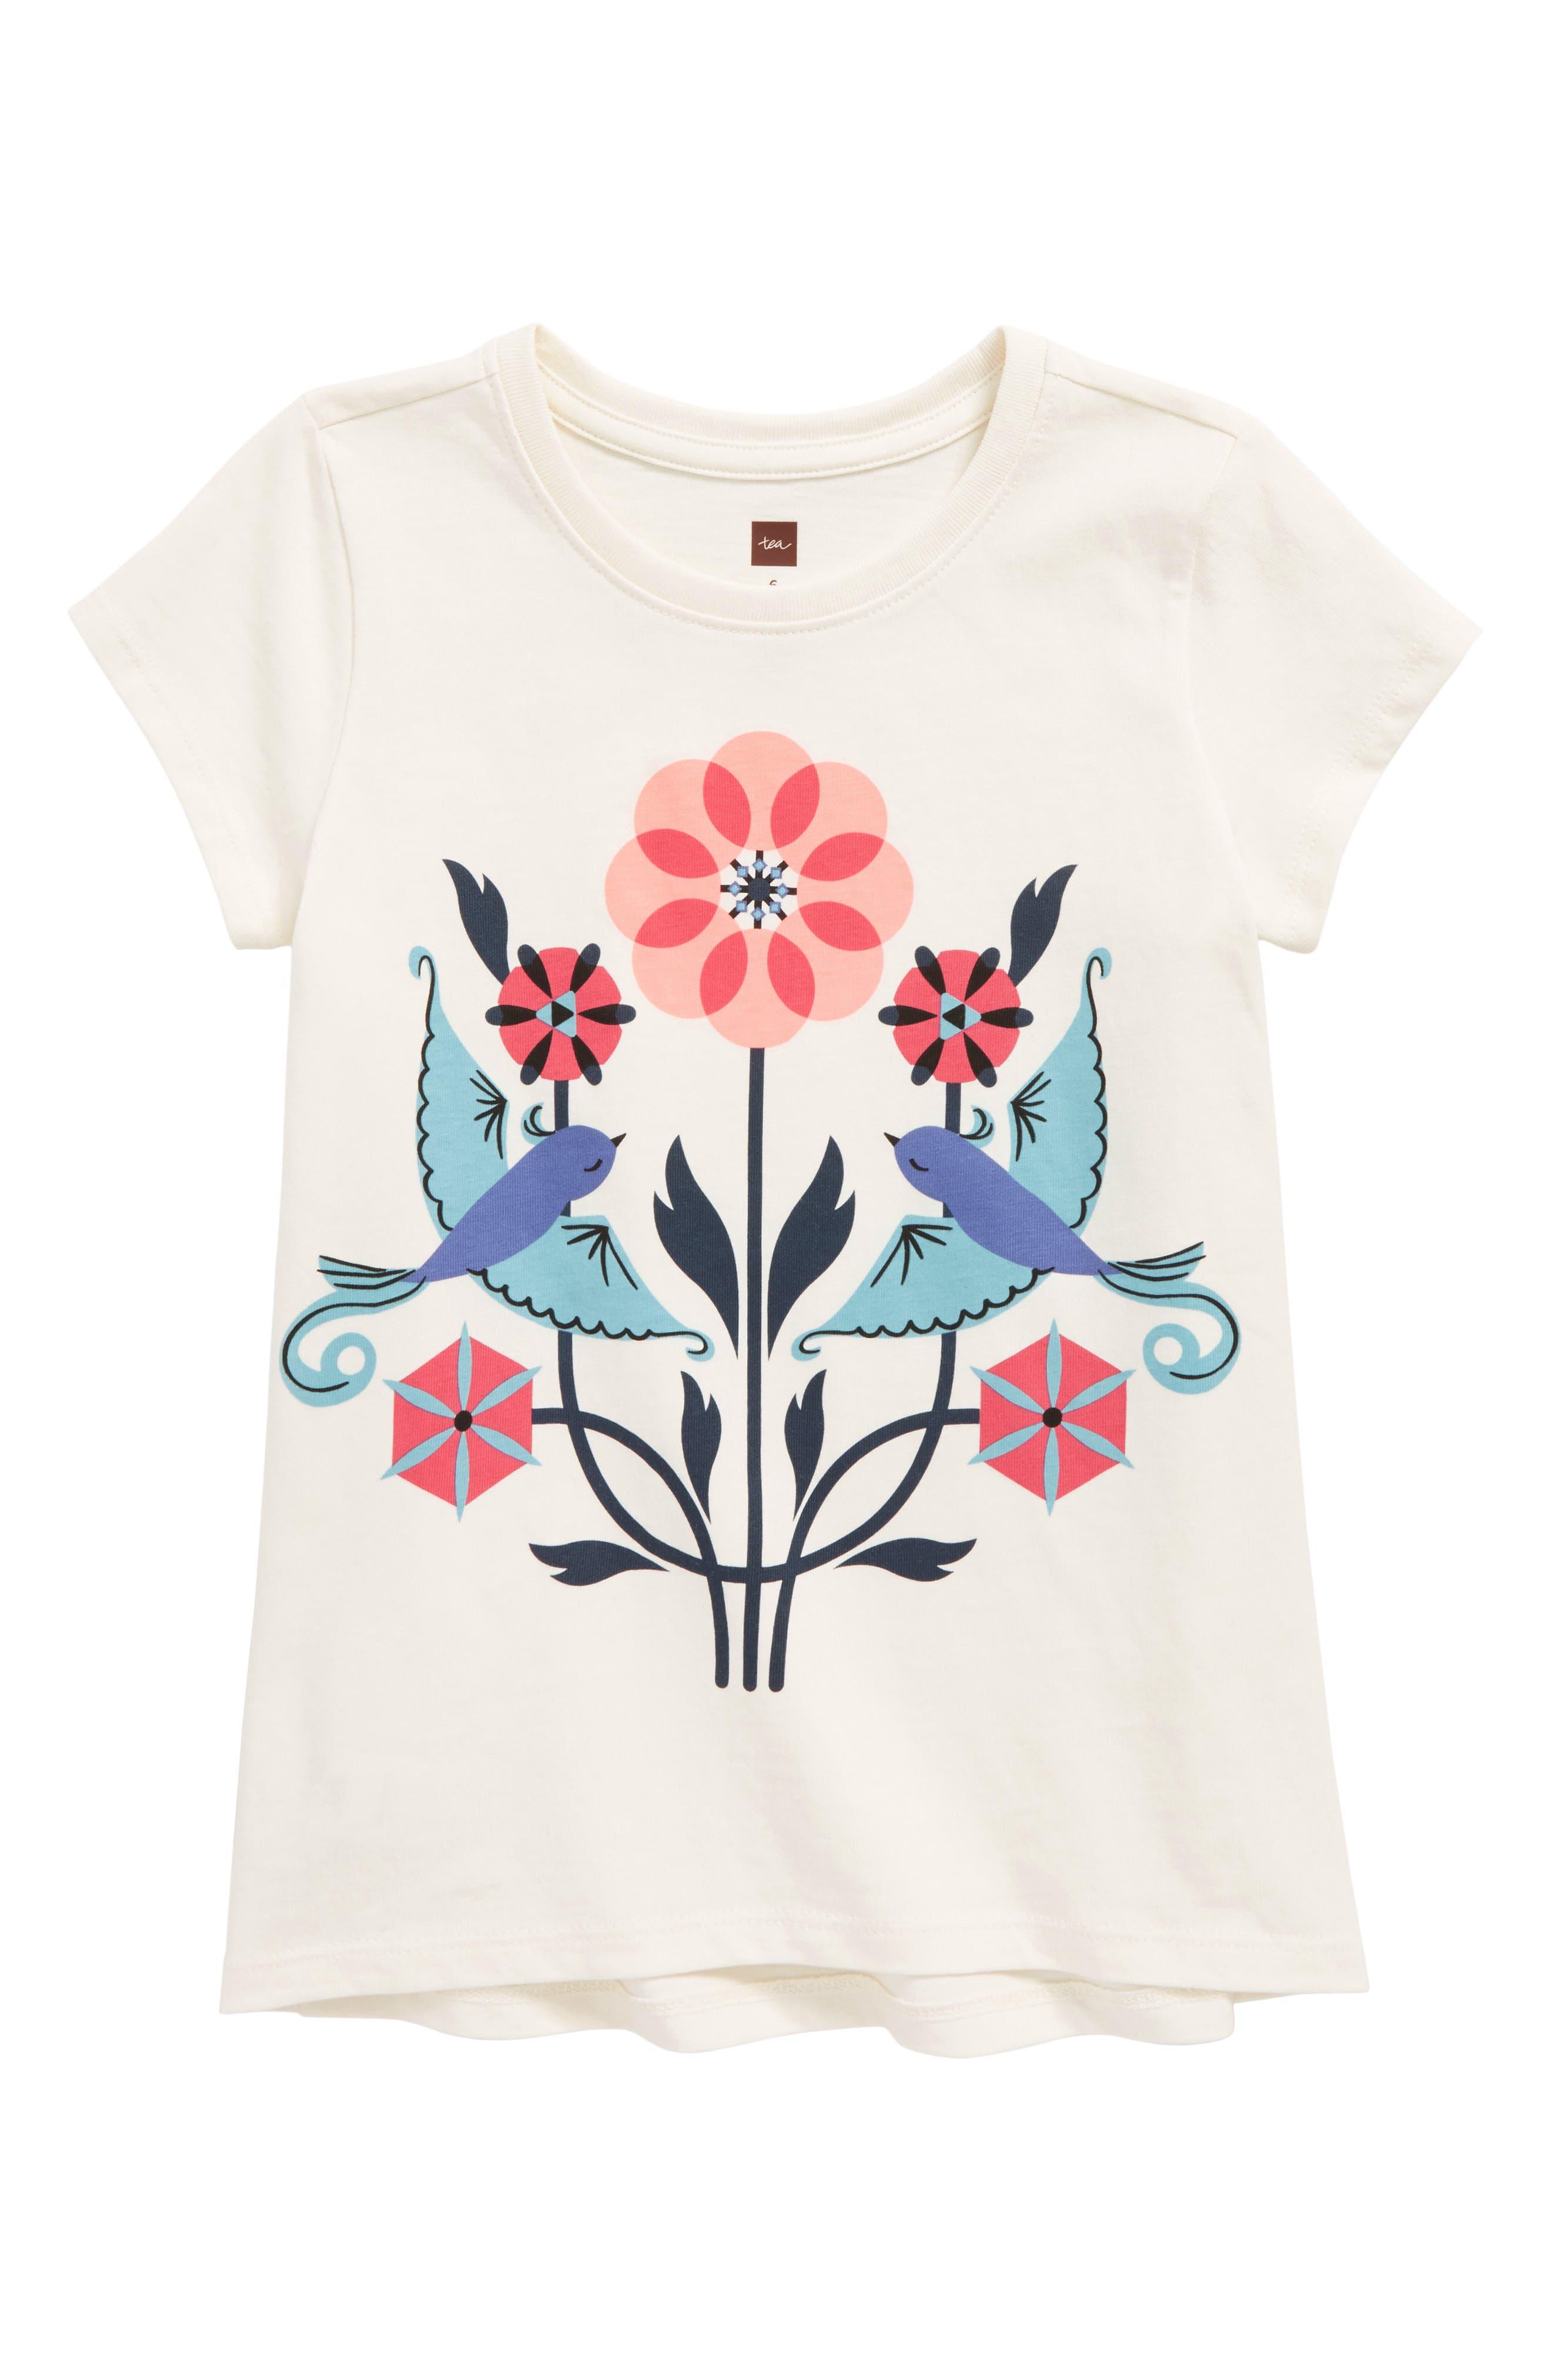 Main Image - Tea Collection Lovebirds Graphic Tee (Toddler Girls, Little Girls & Big Girls)